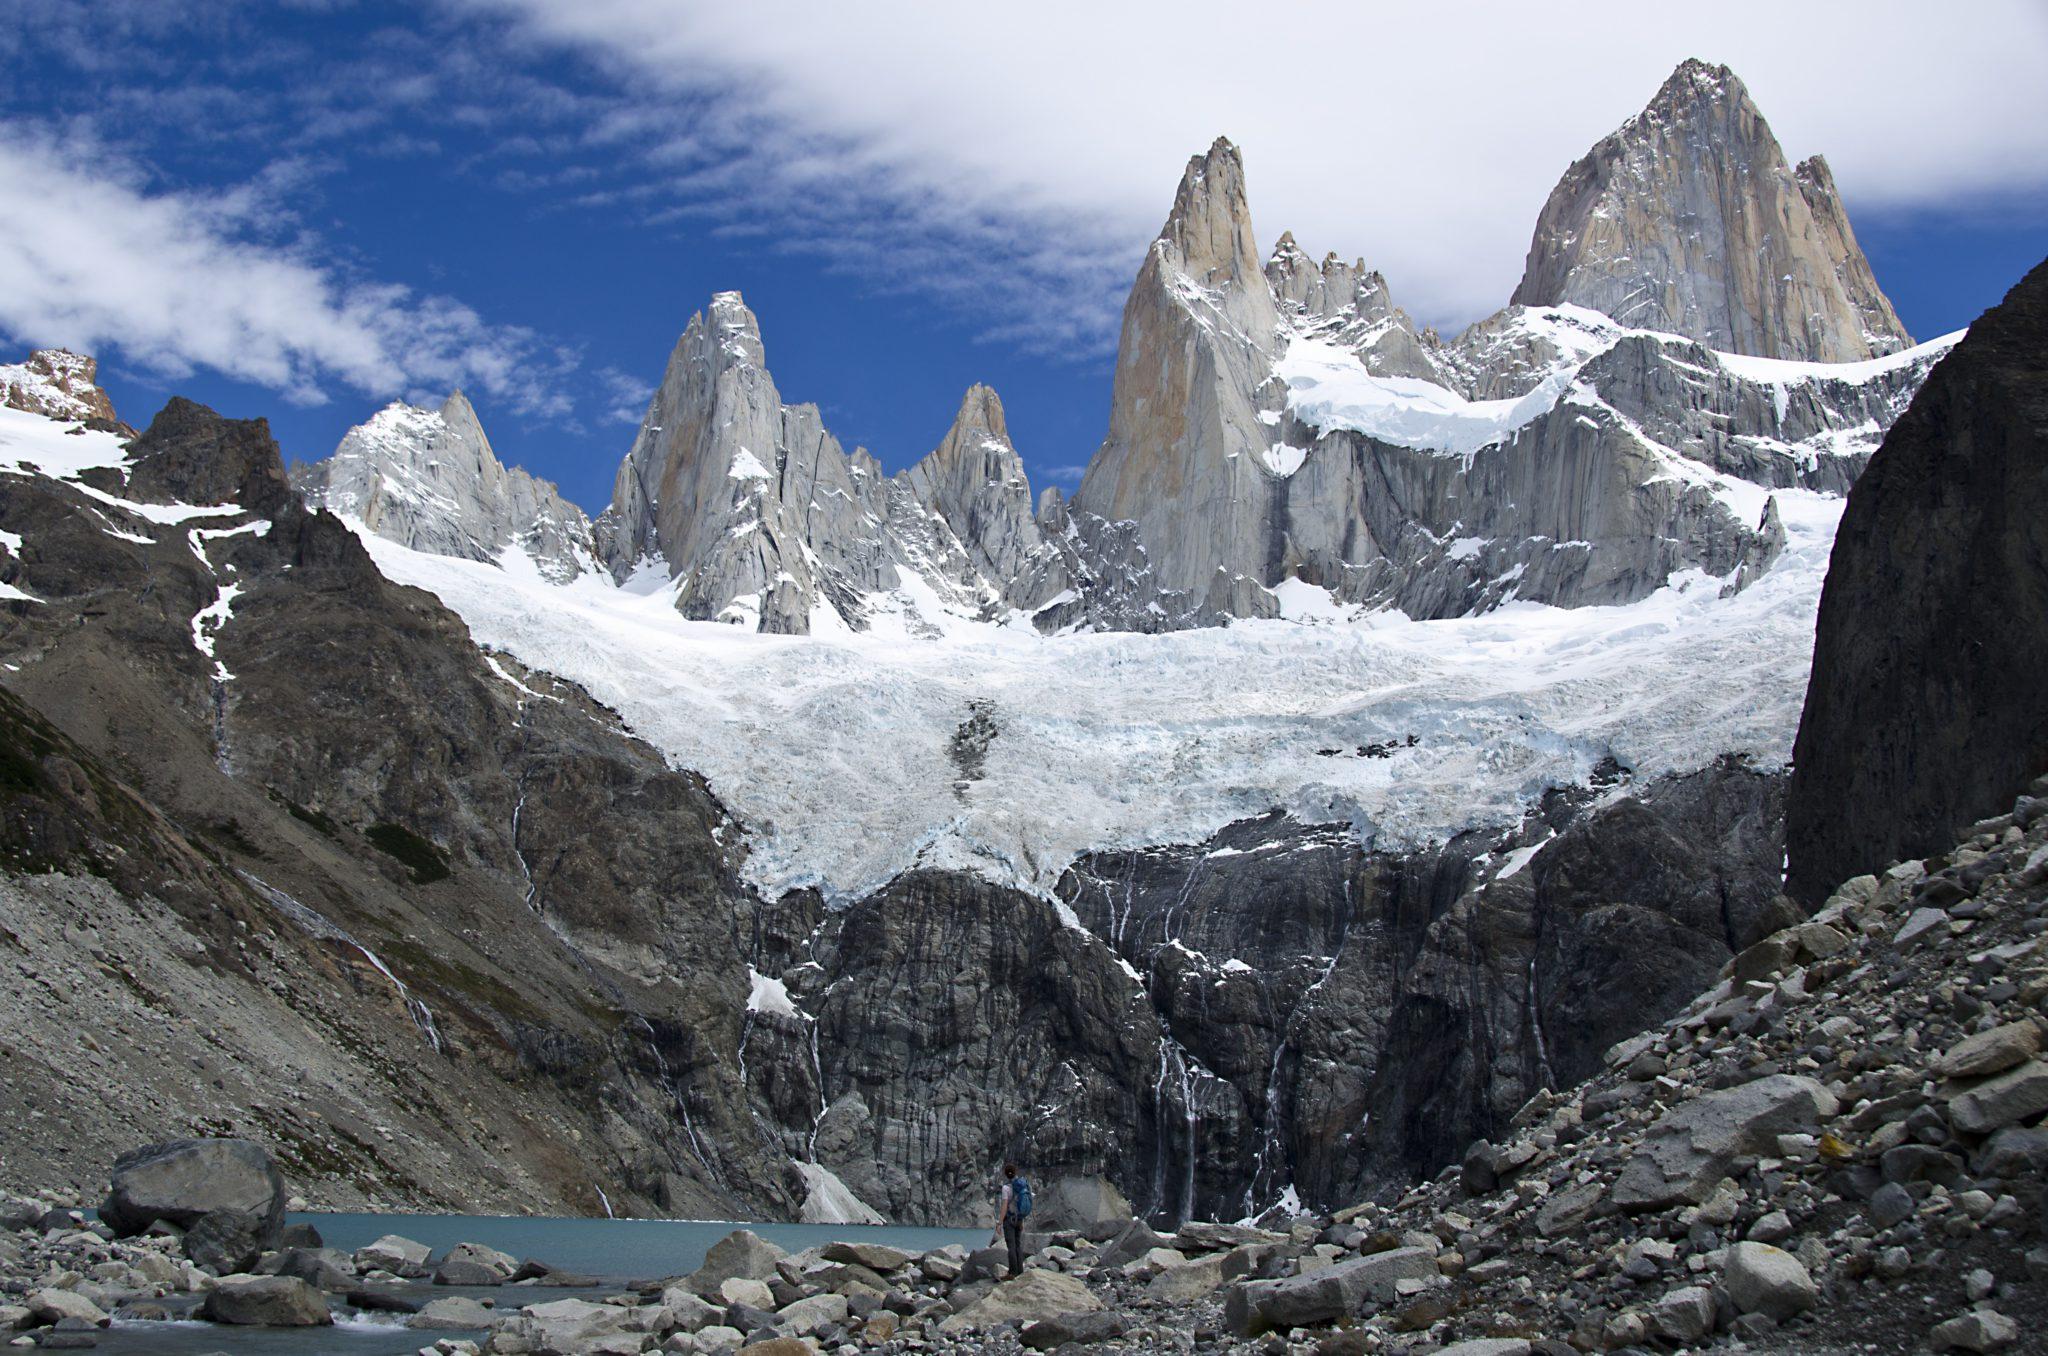 Argentina multi activity holiday in Patagonia: Hike, climb & MTB